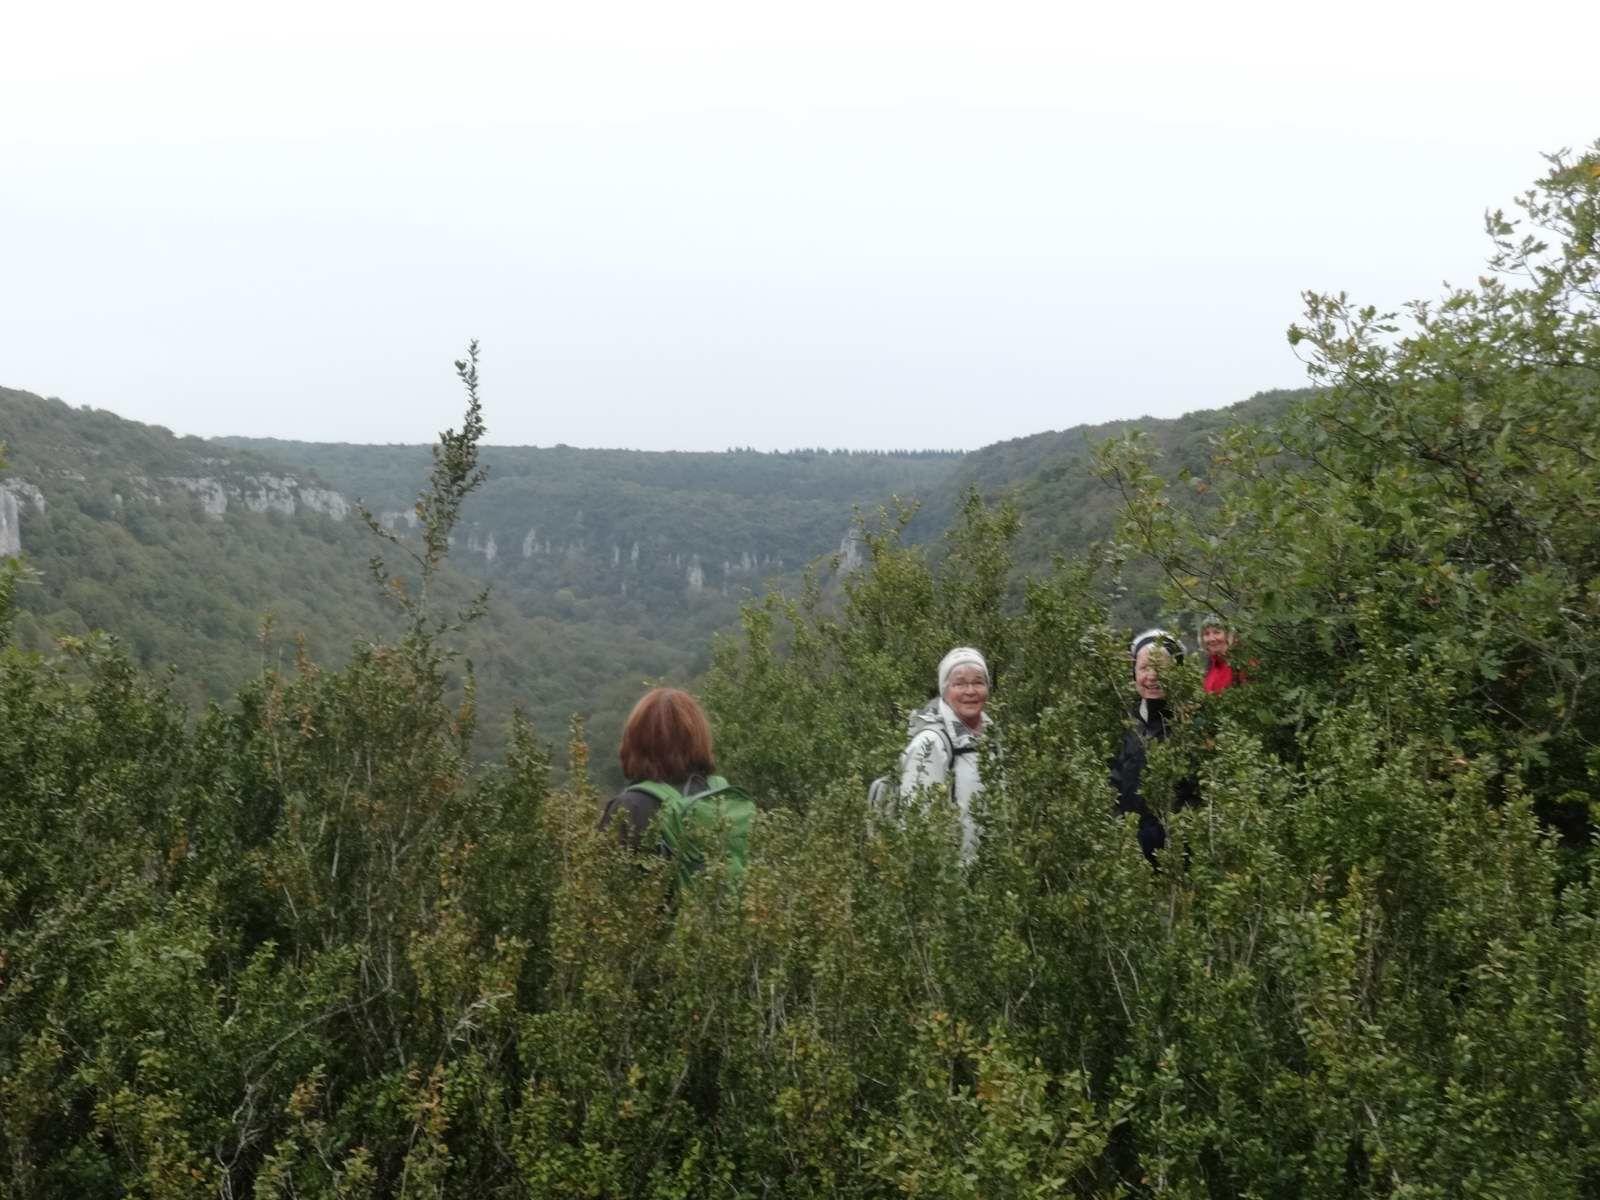 Dans les combes au-dessus de Gevrey-Chambertin (13/10/2016)